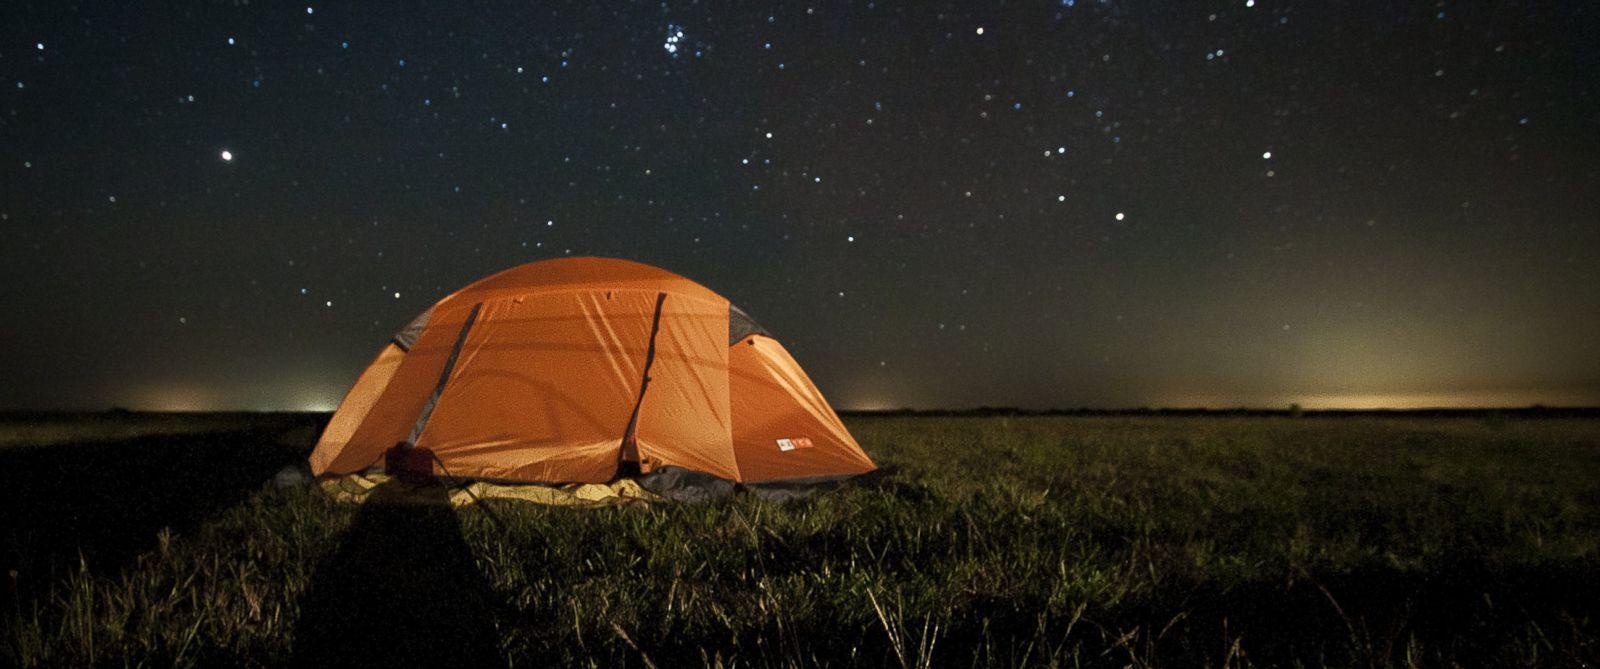 gty_camping_kb_140711_12x5_1600